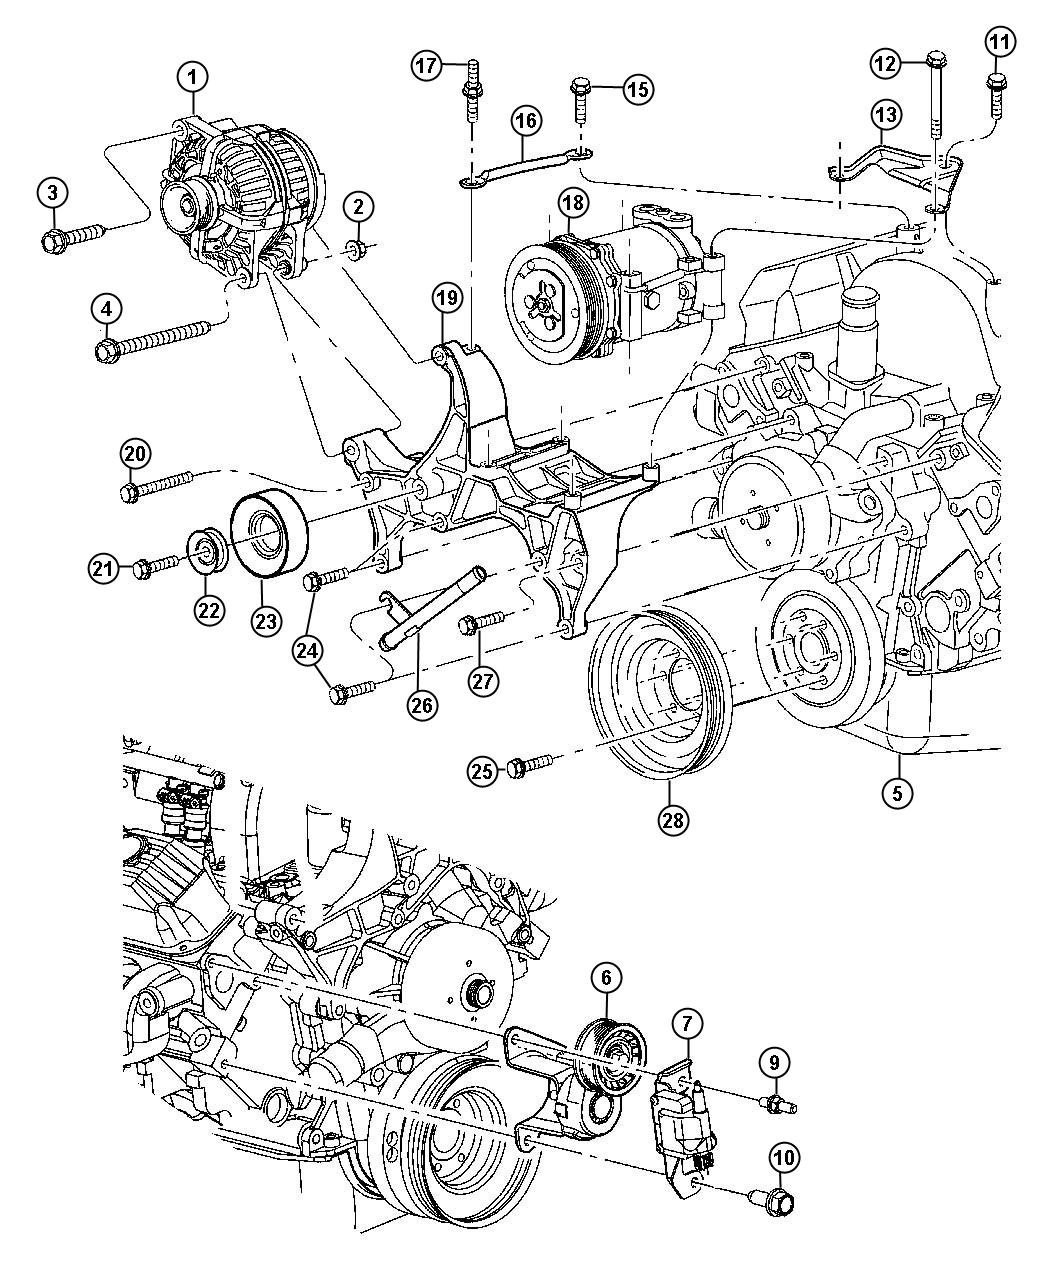 3 9l engine diagram wiring wiring diagrams instructions rh wws5 ww w freeautoresponder co 5 3l engine cummins diesel engines